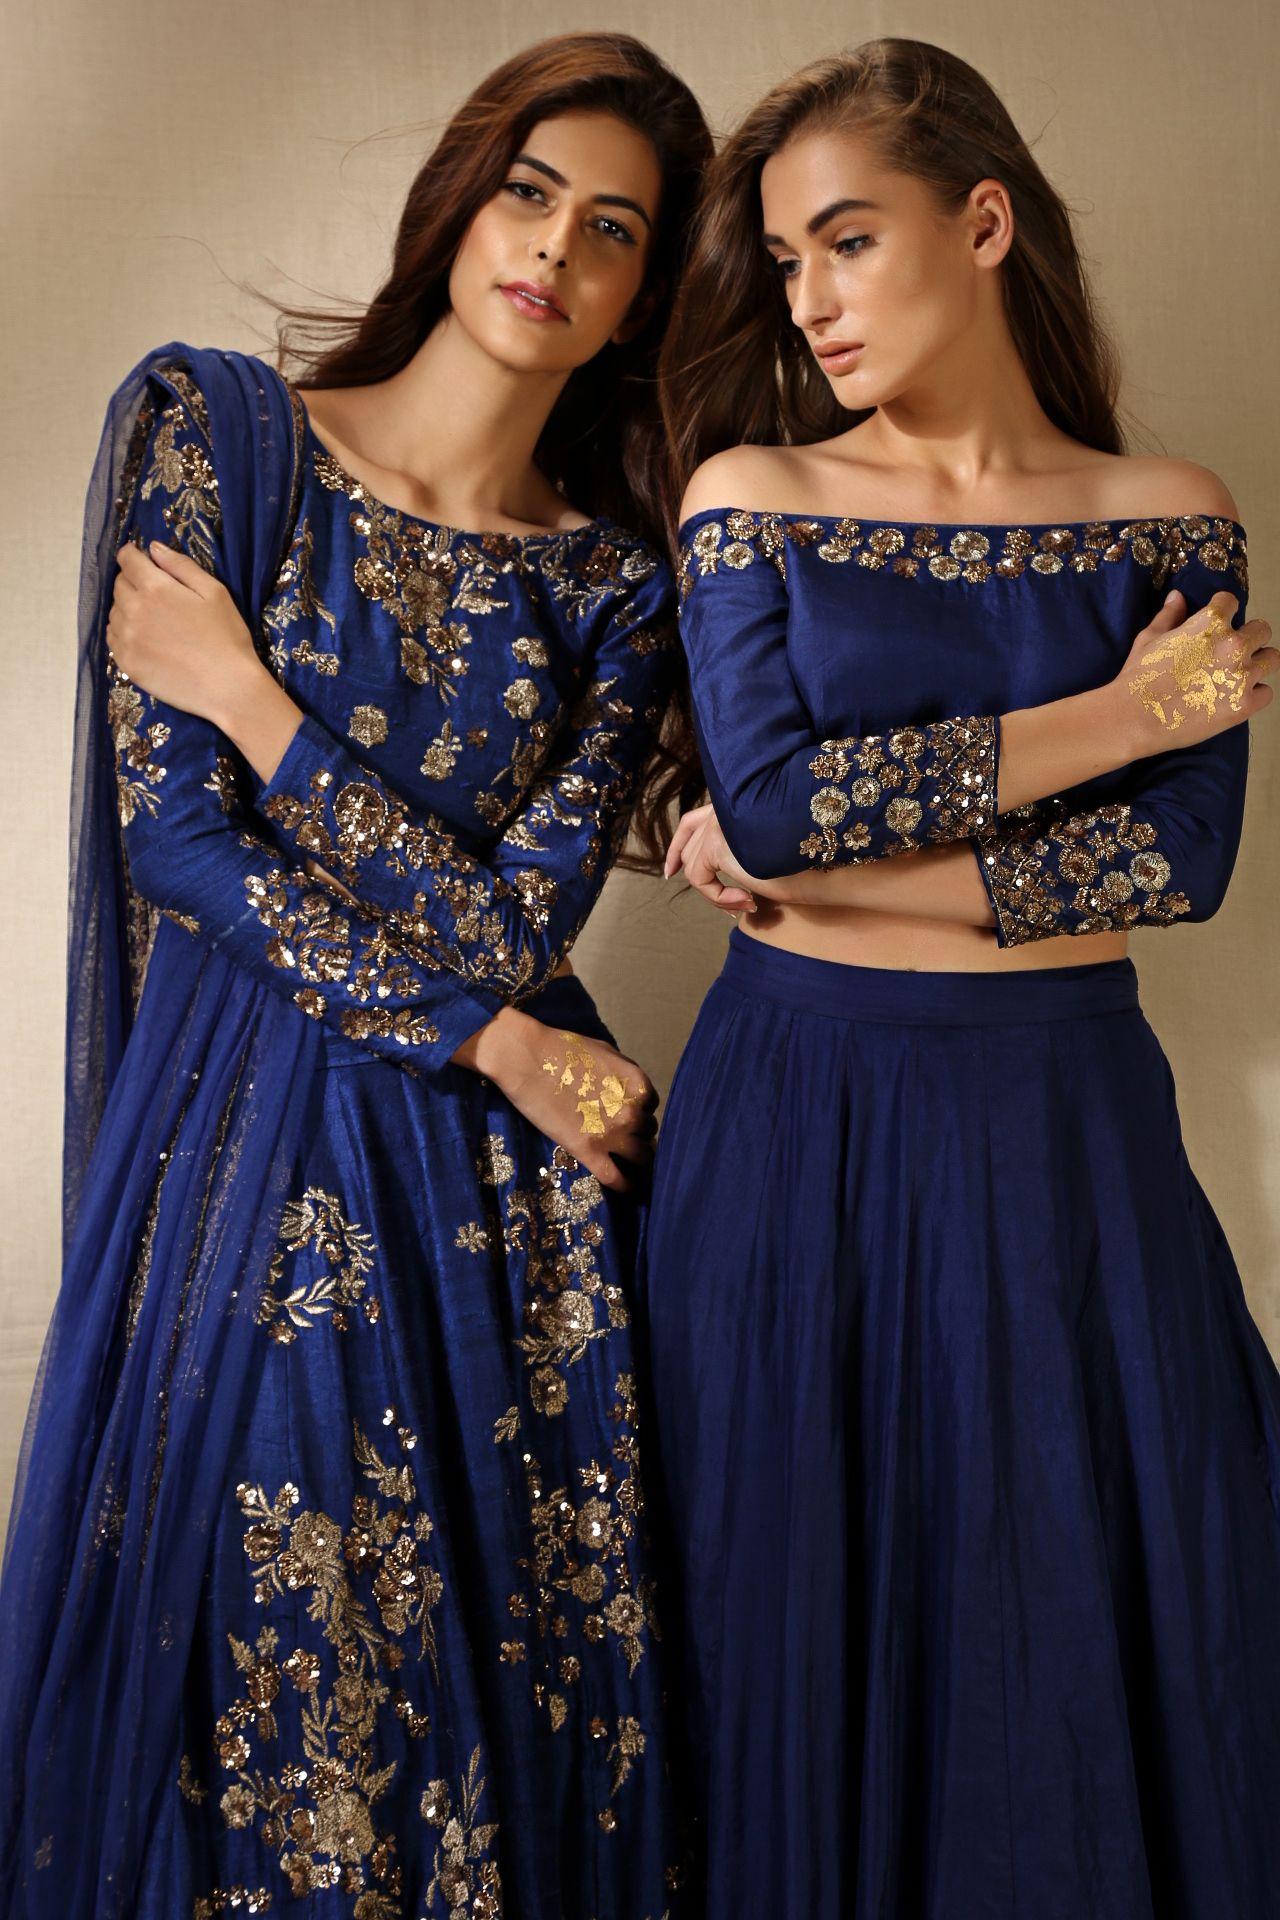 c4196485f9 @karayxx More. @karayxx More India Fashion, Indian ...